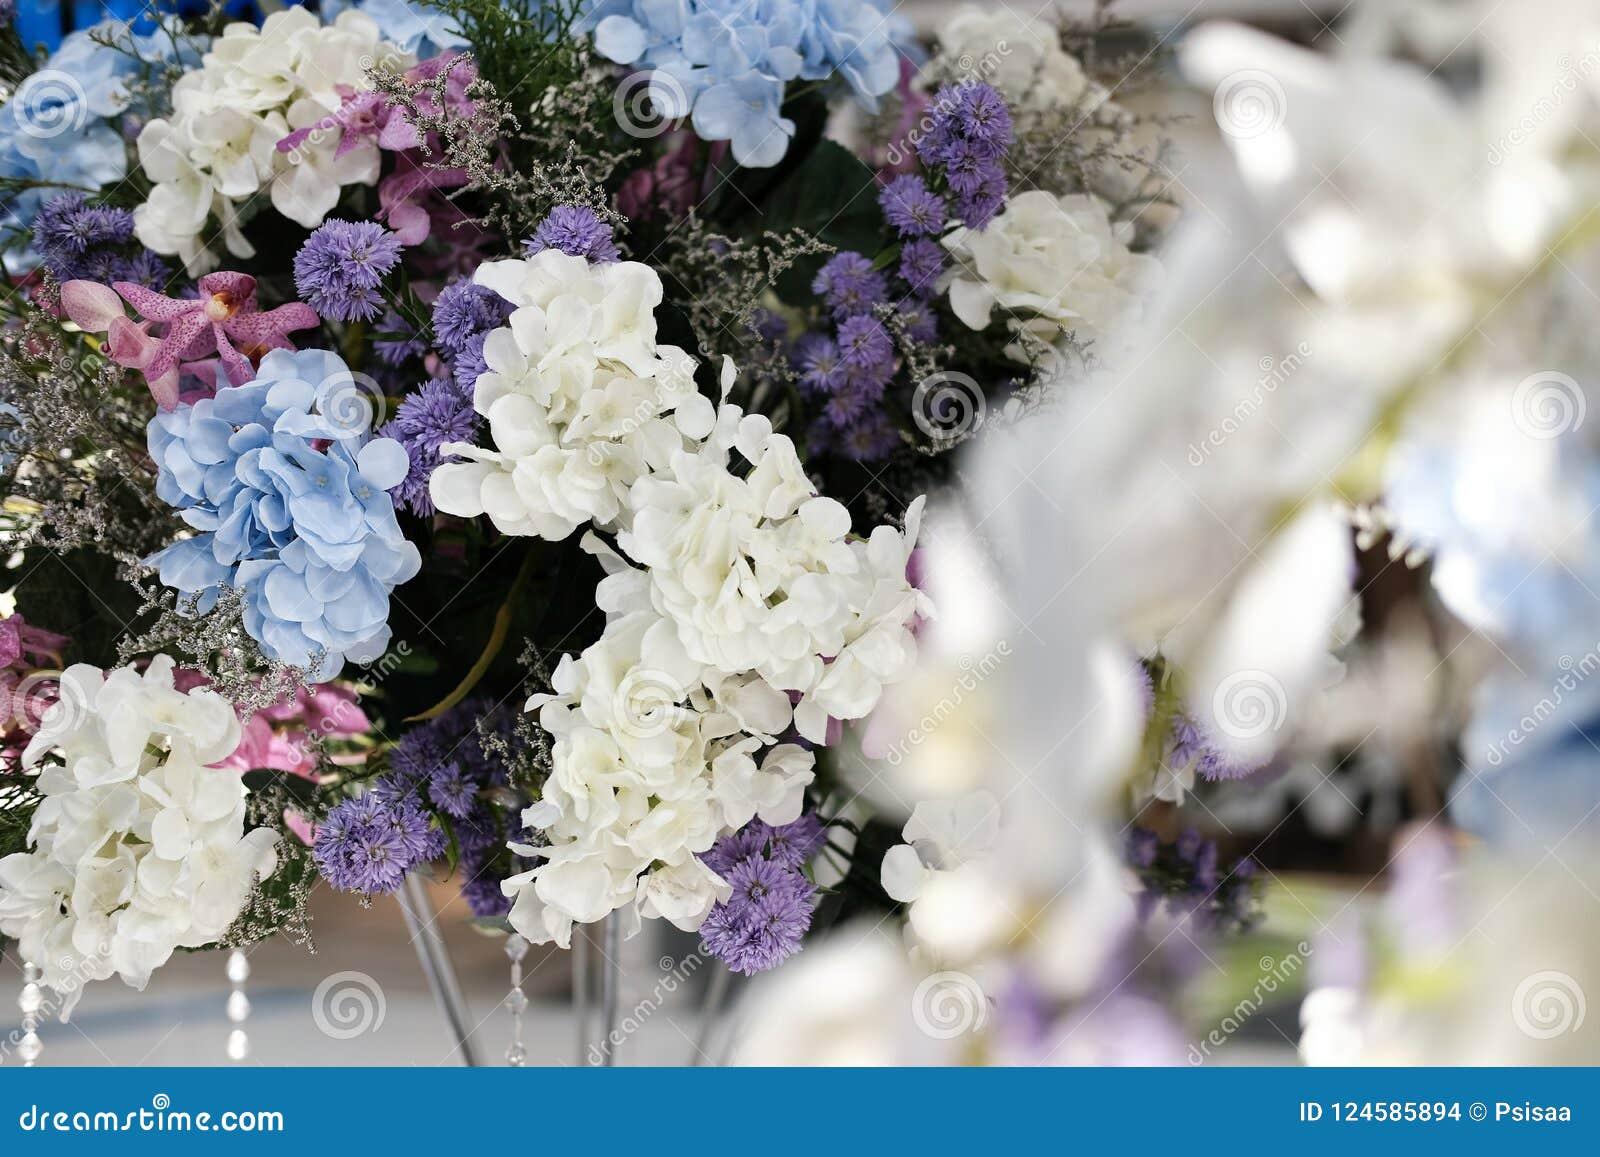 Artificial Blue White Hydrangea Flower Bouquet Stock Photo Image